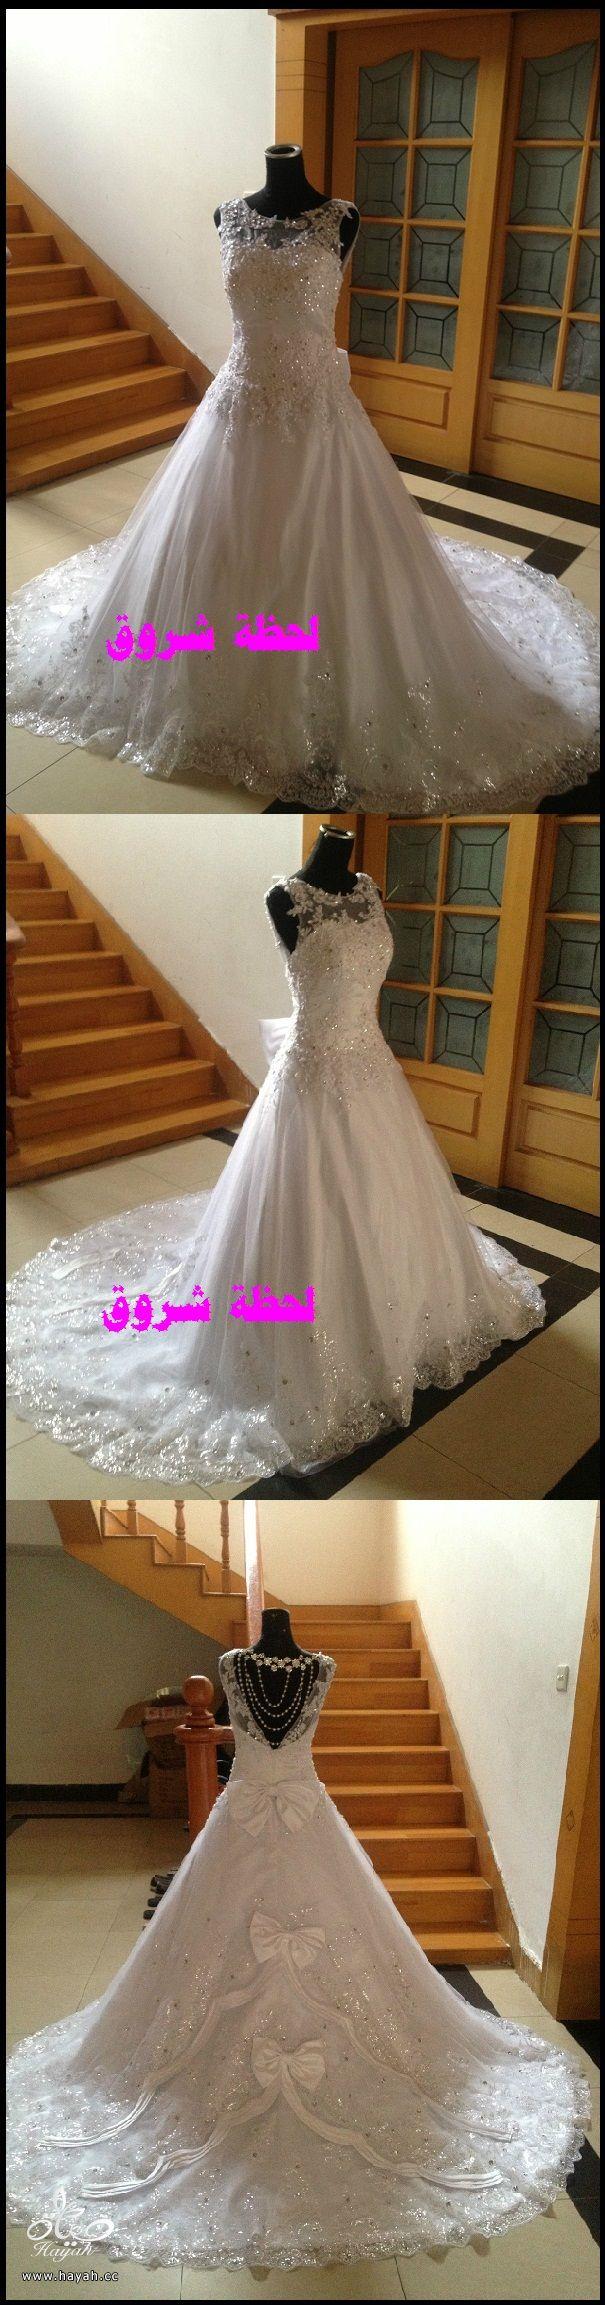 hayahcc_1394492105_664.jpg